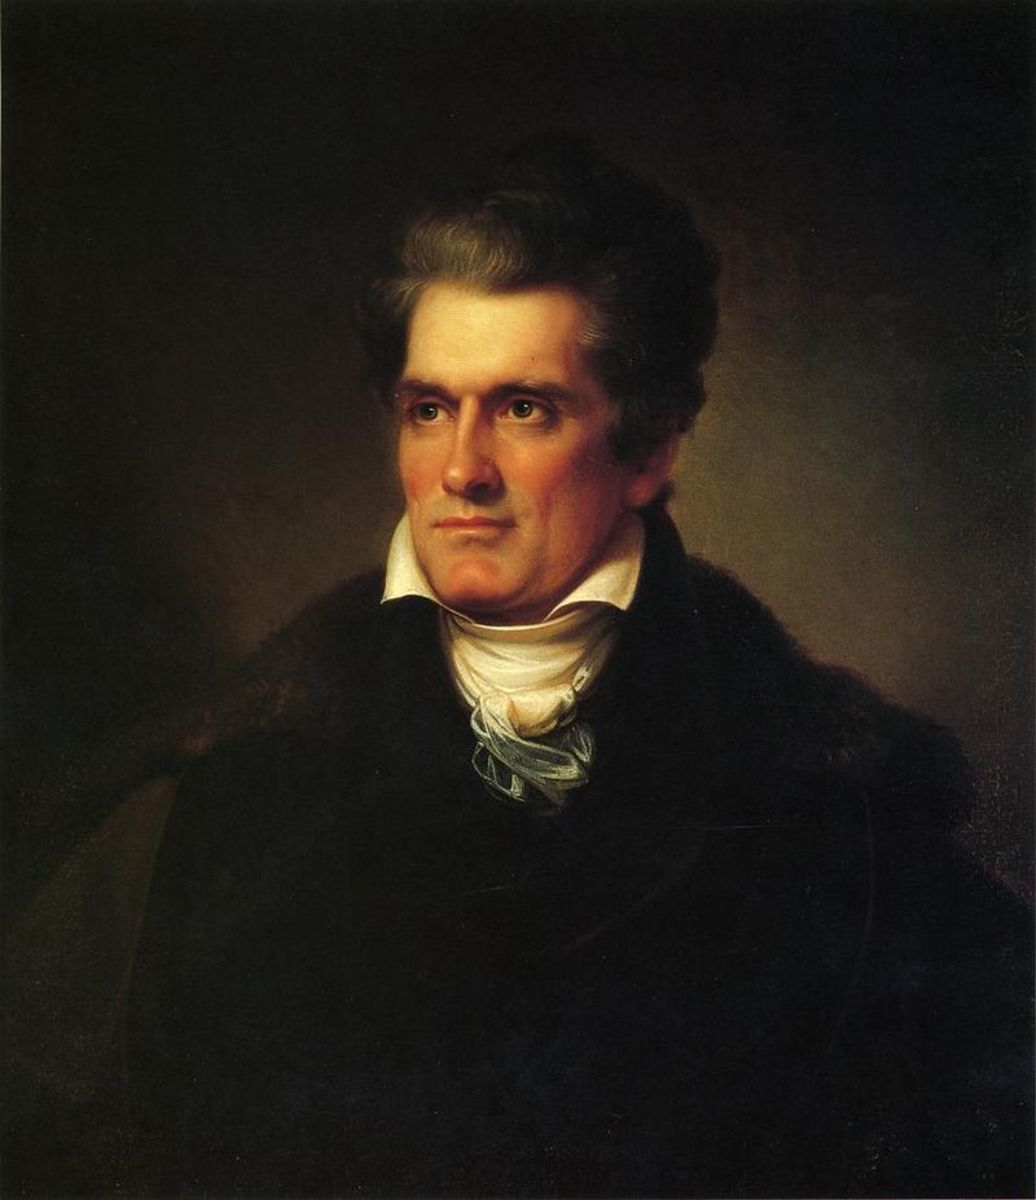 John C. Calhoun circa 1834.